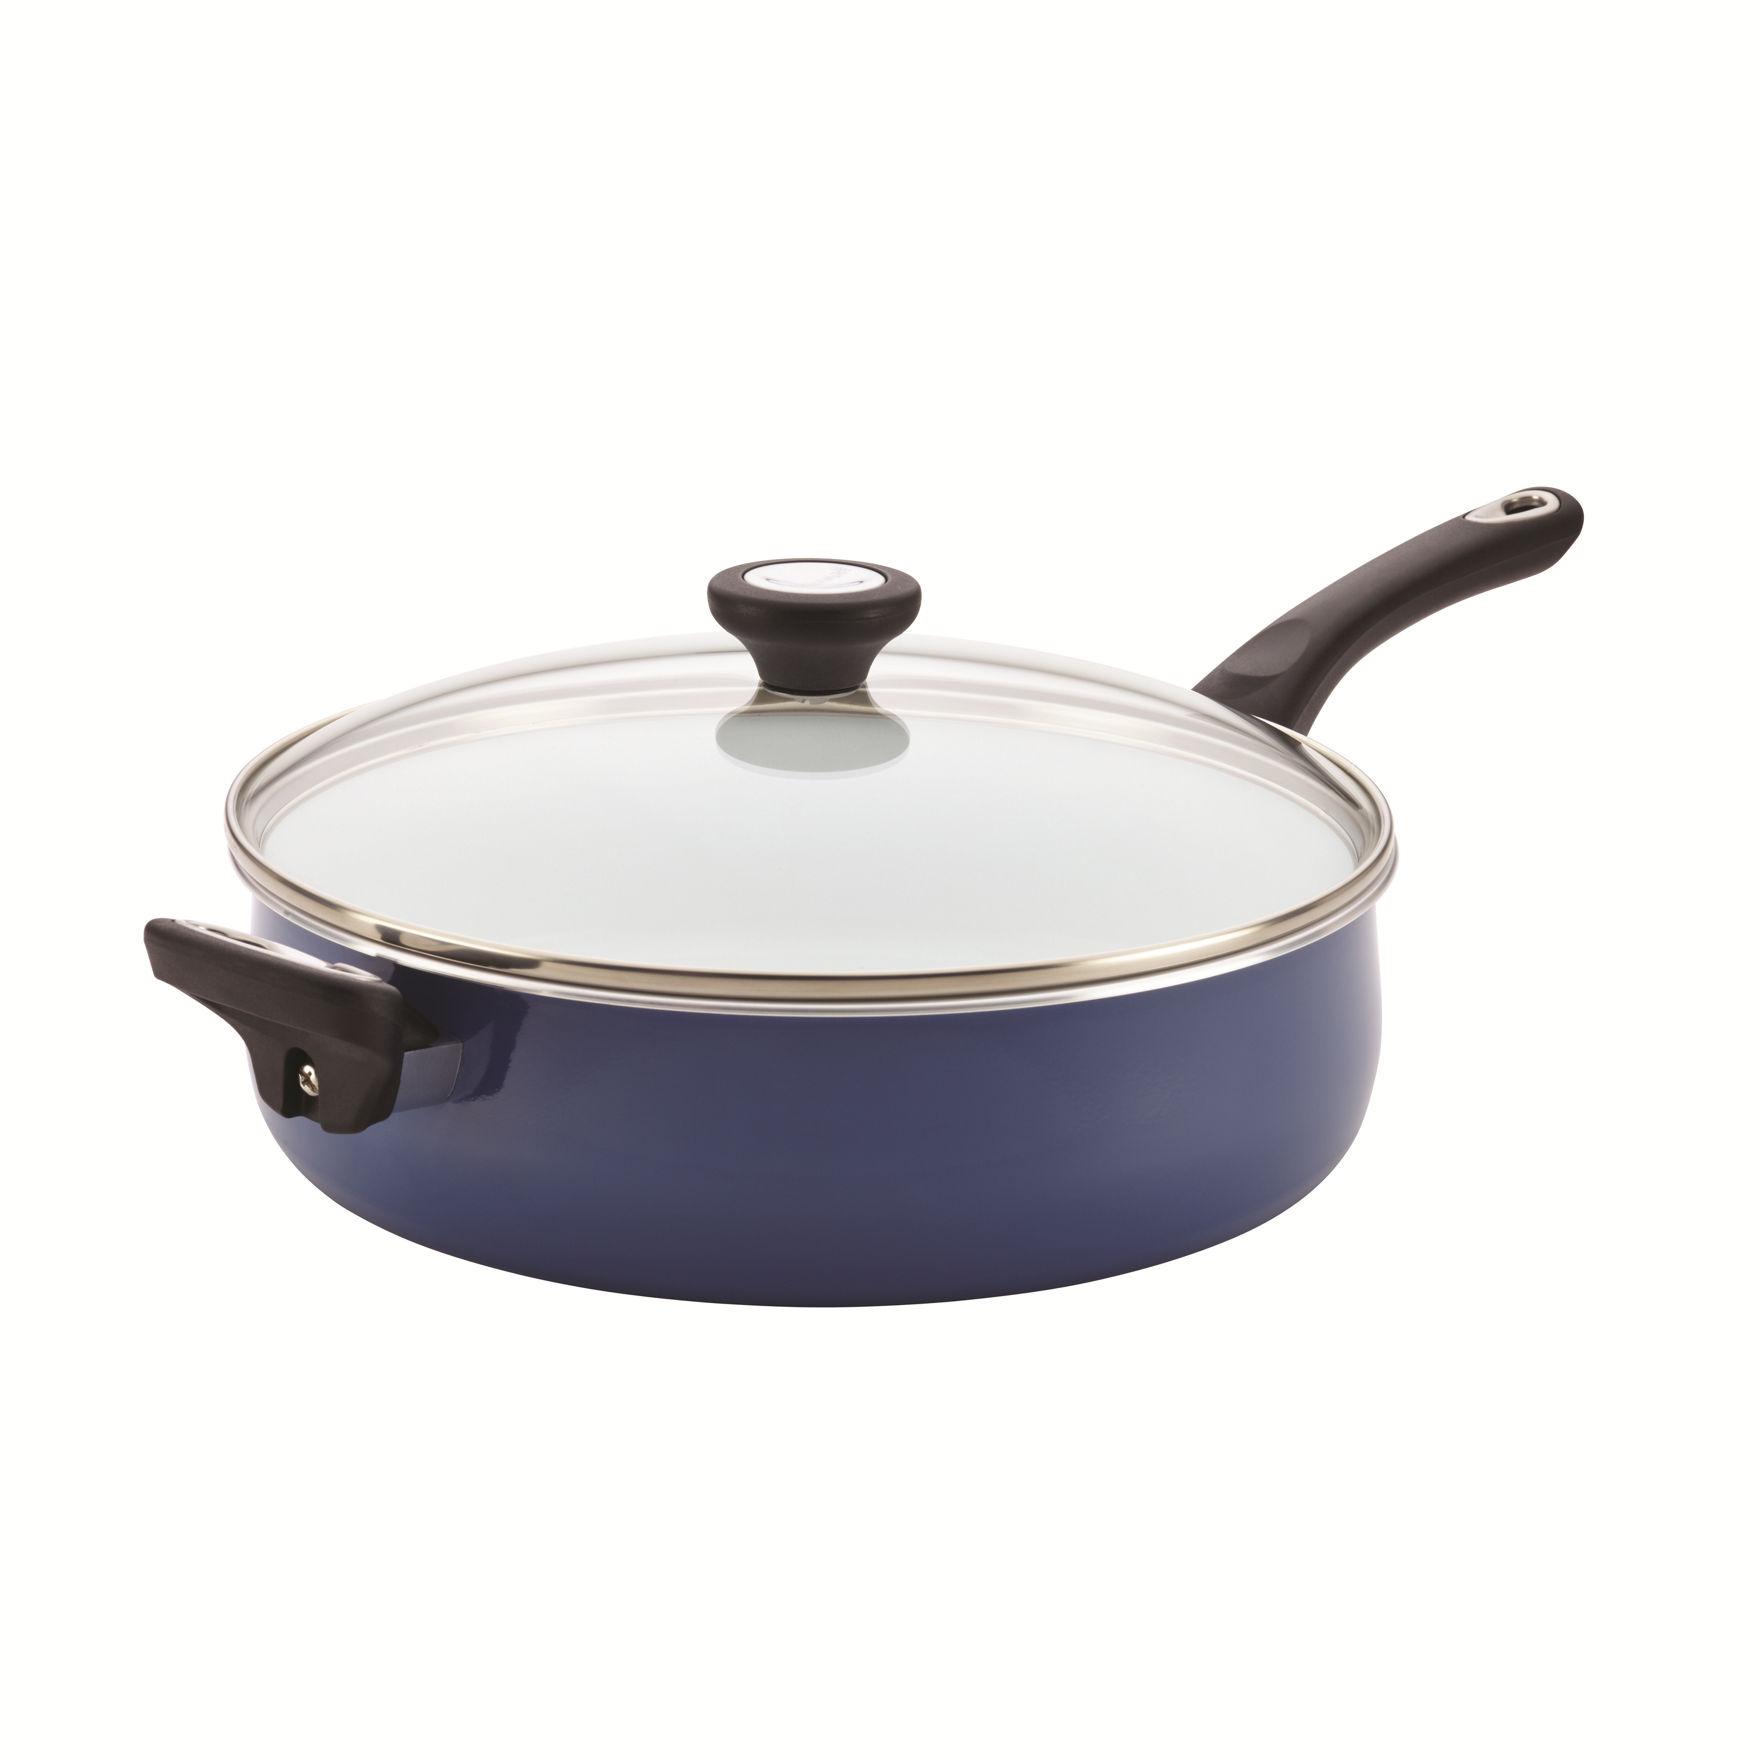 Farberware Blue Pots & Dutch Ovens Cookware